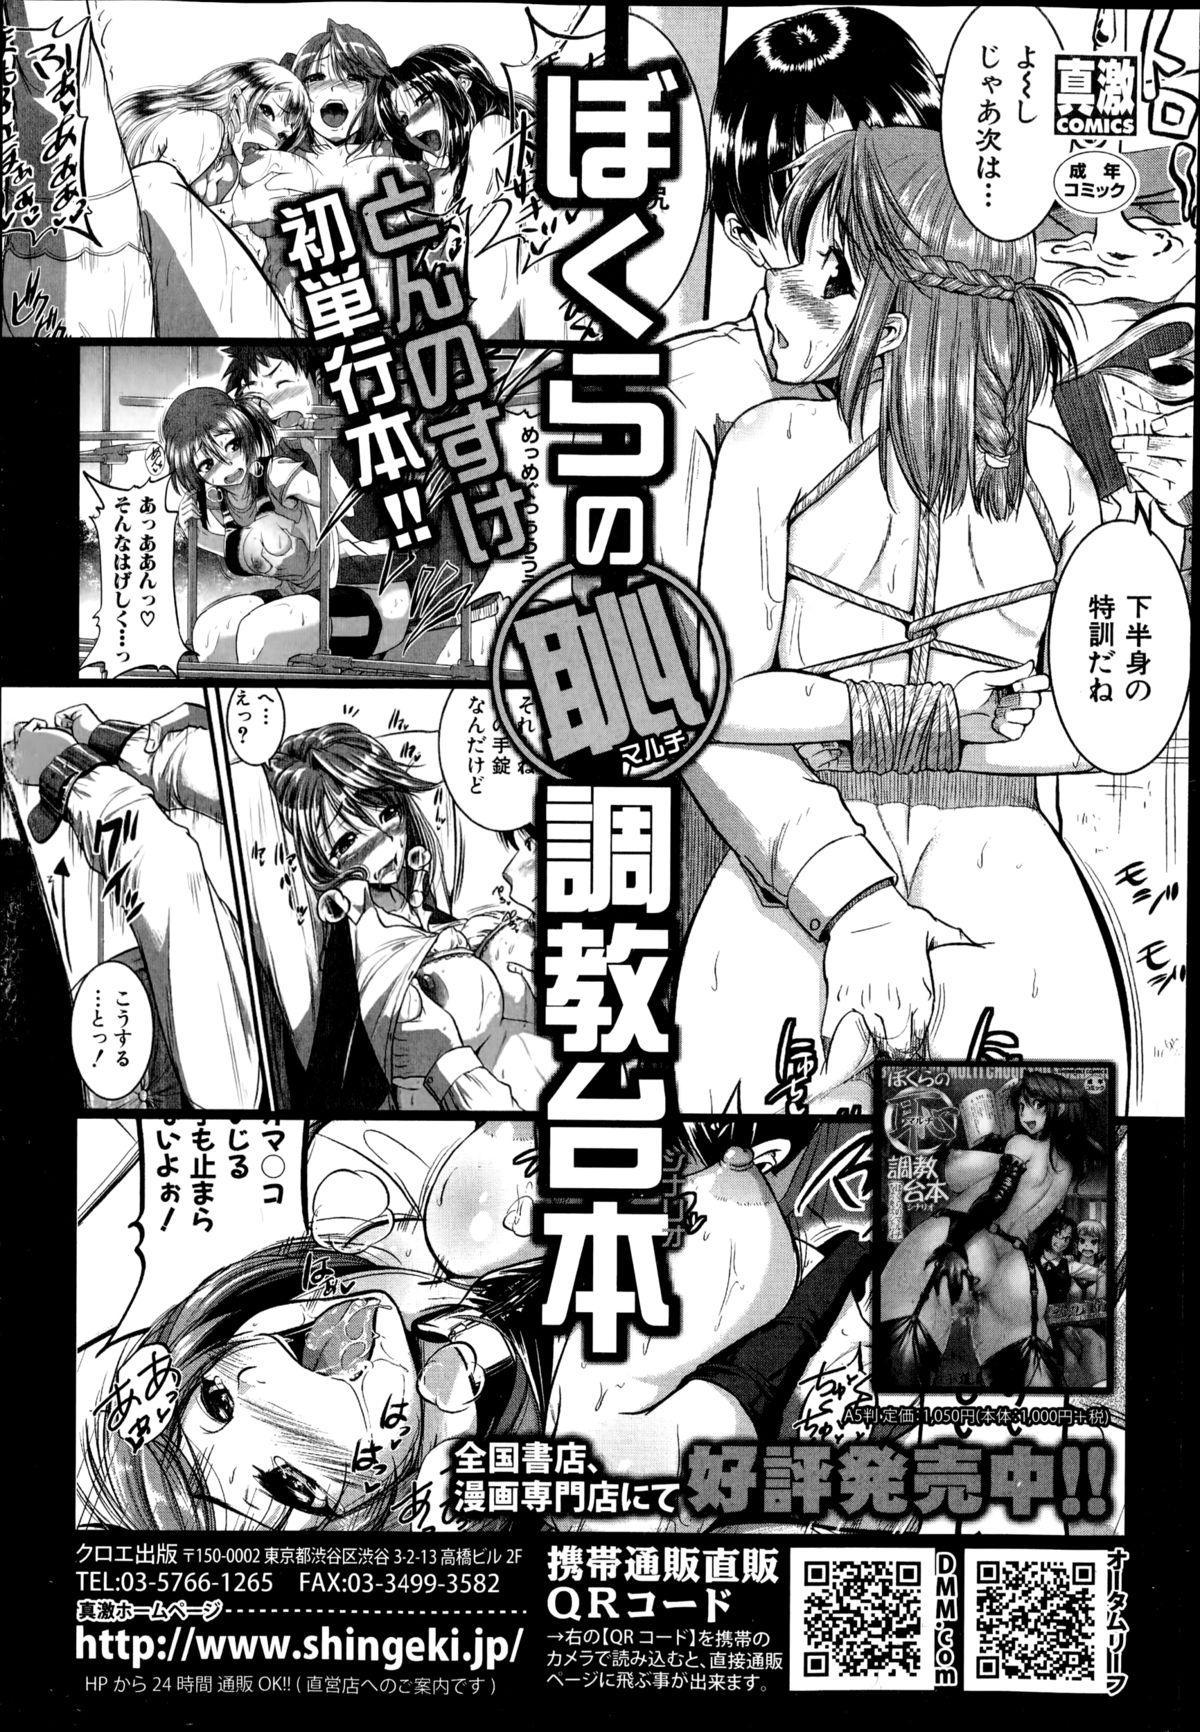 COMIC Shingeki 2014-12 92